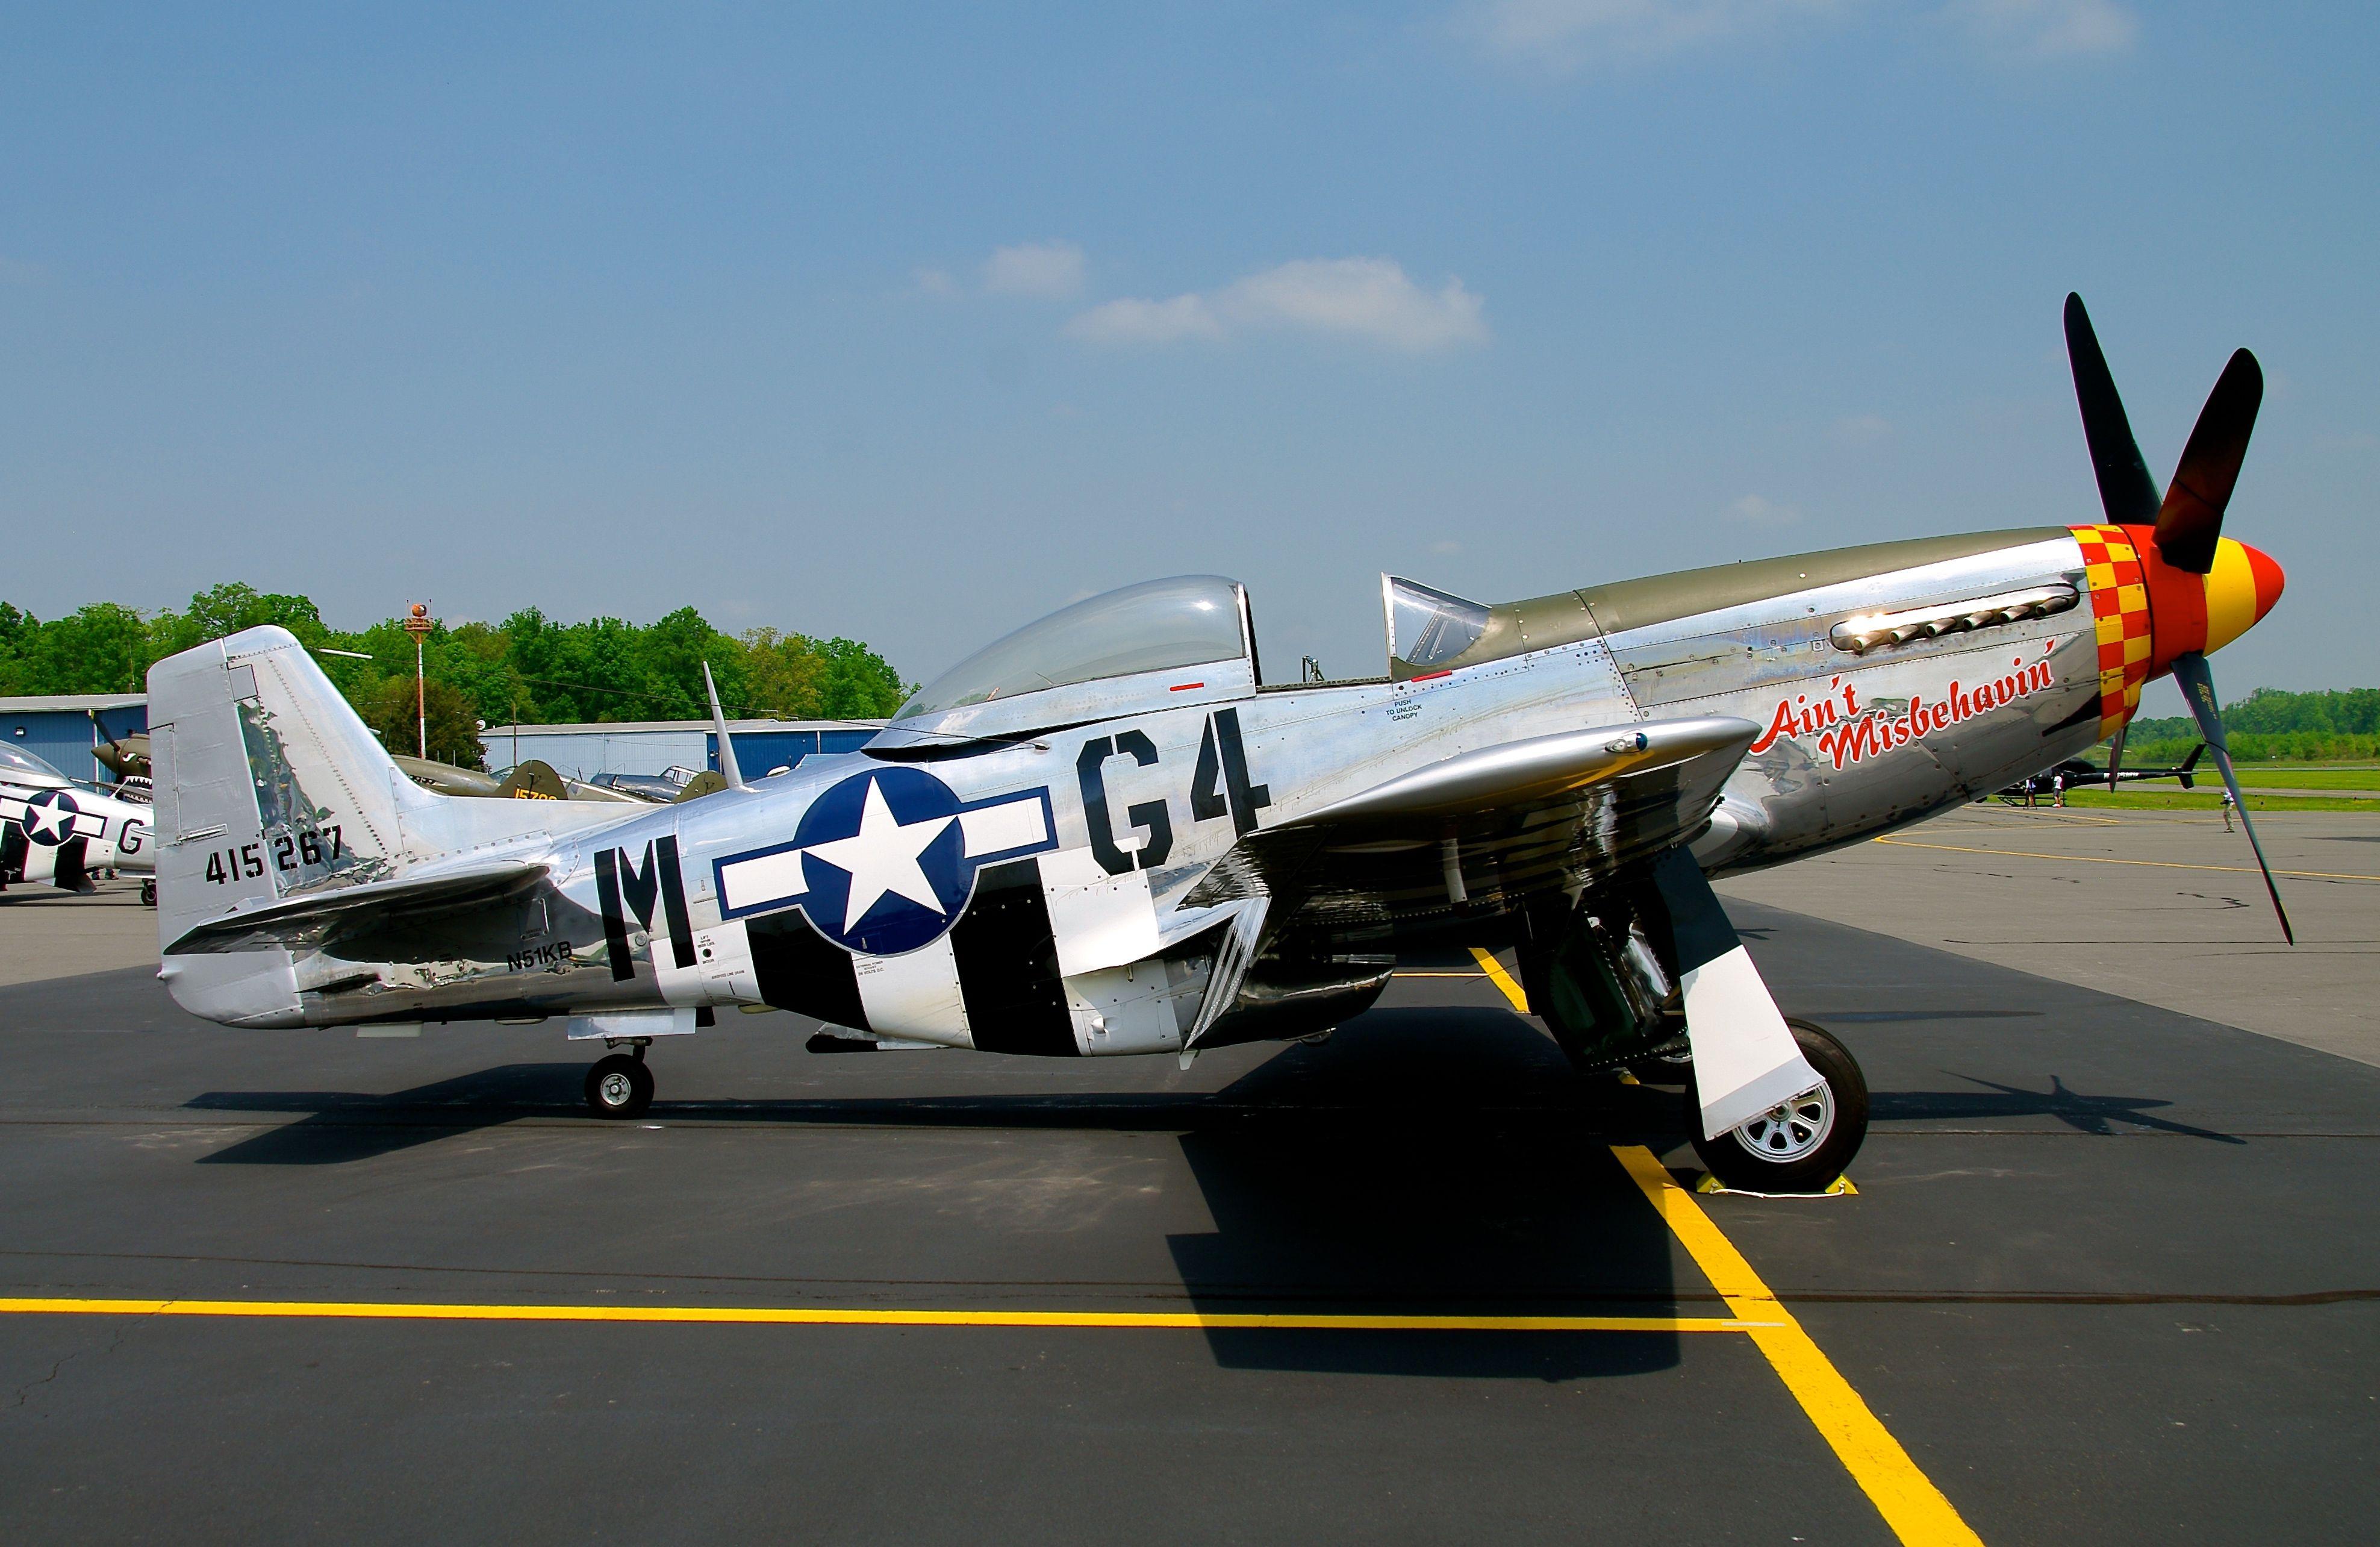 North American Mustang P-51D Vintage Aircraft Art Print 13 x 19